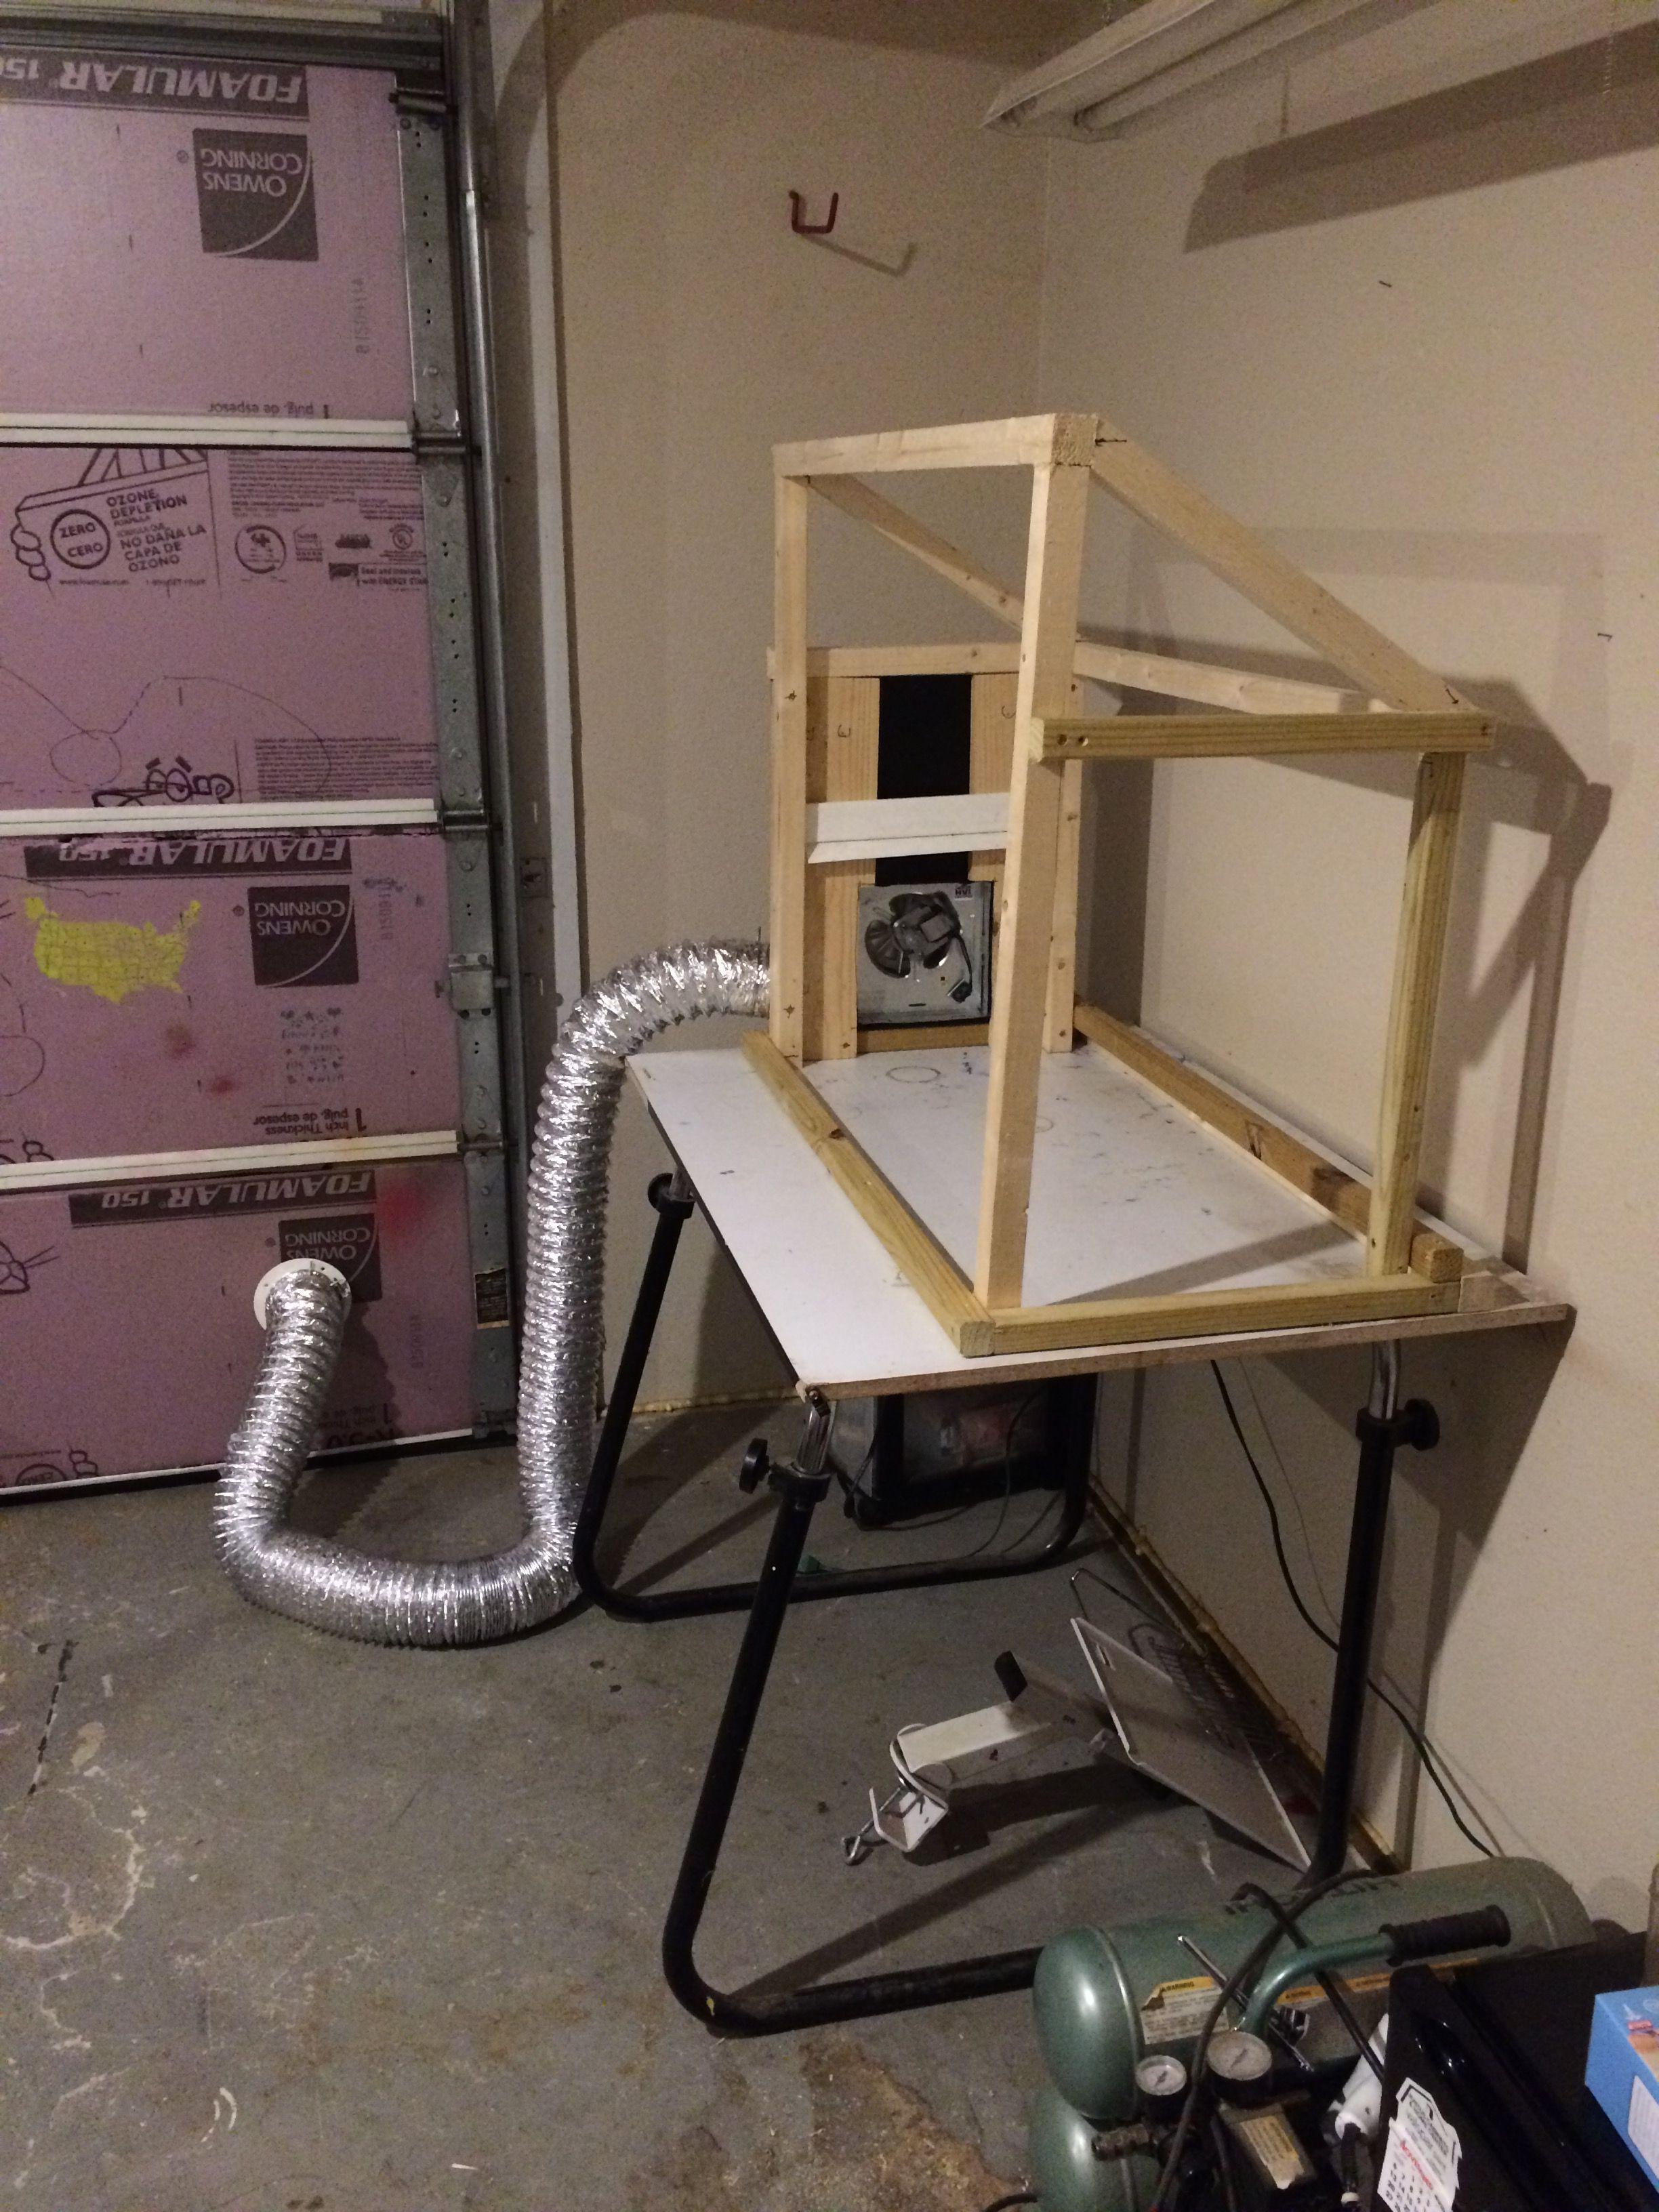 Garage Airbrush Paint Booth, exhaust fan, flex house